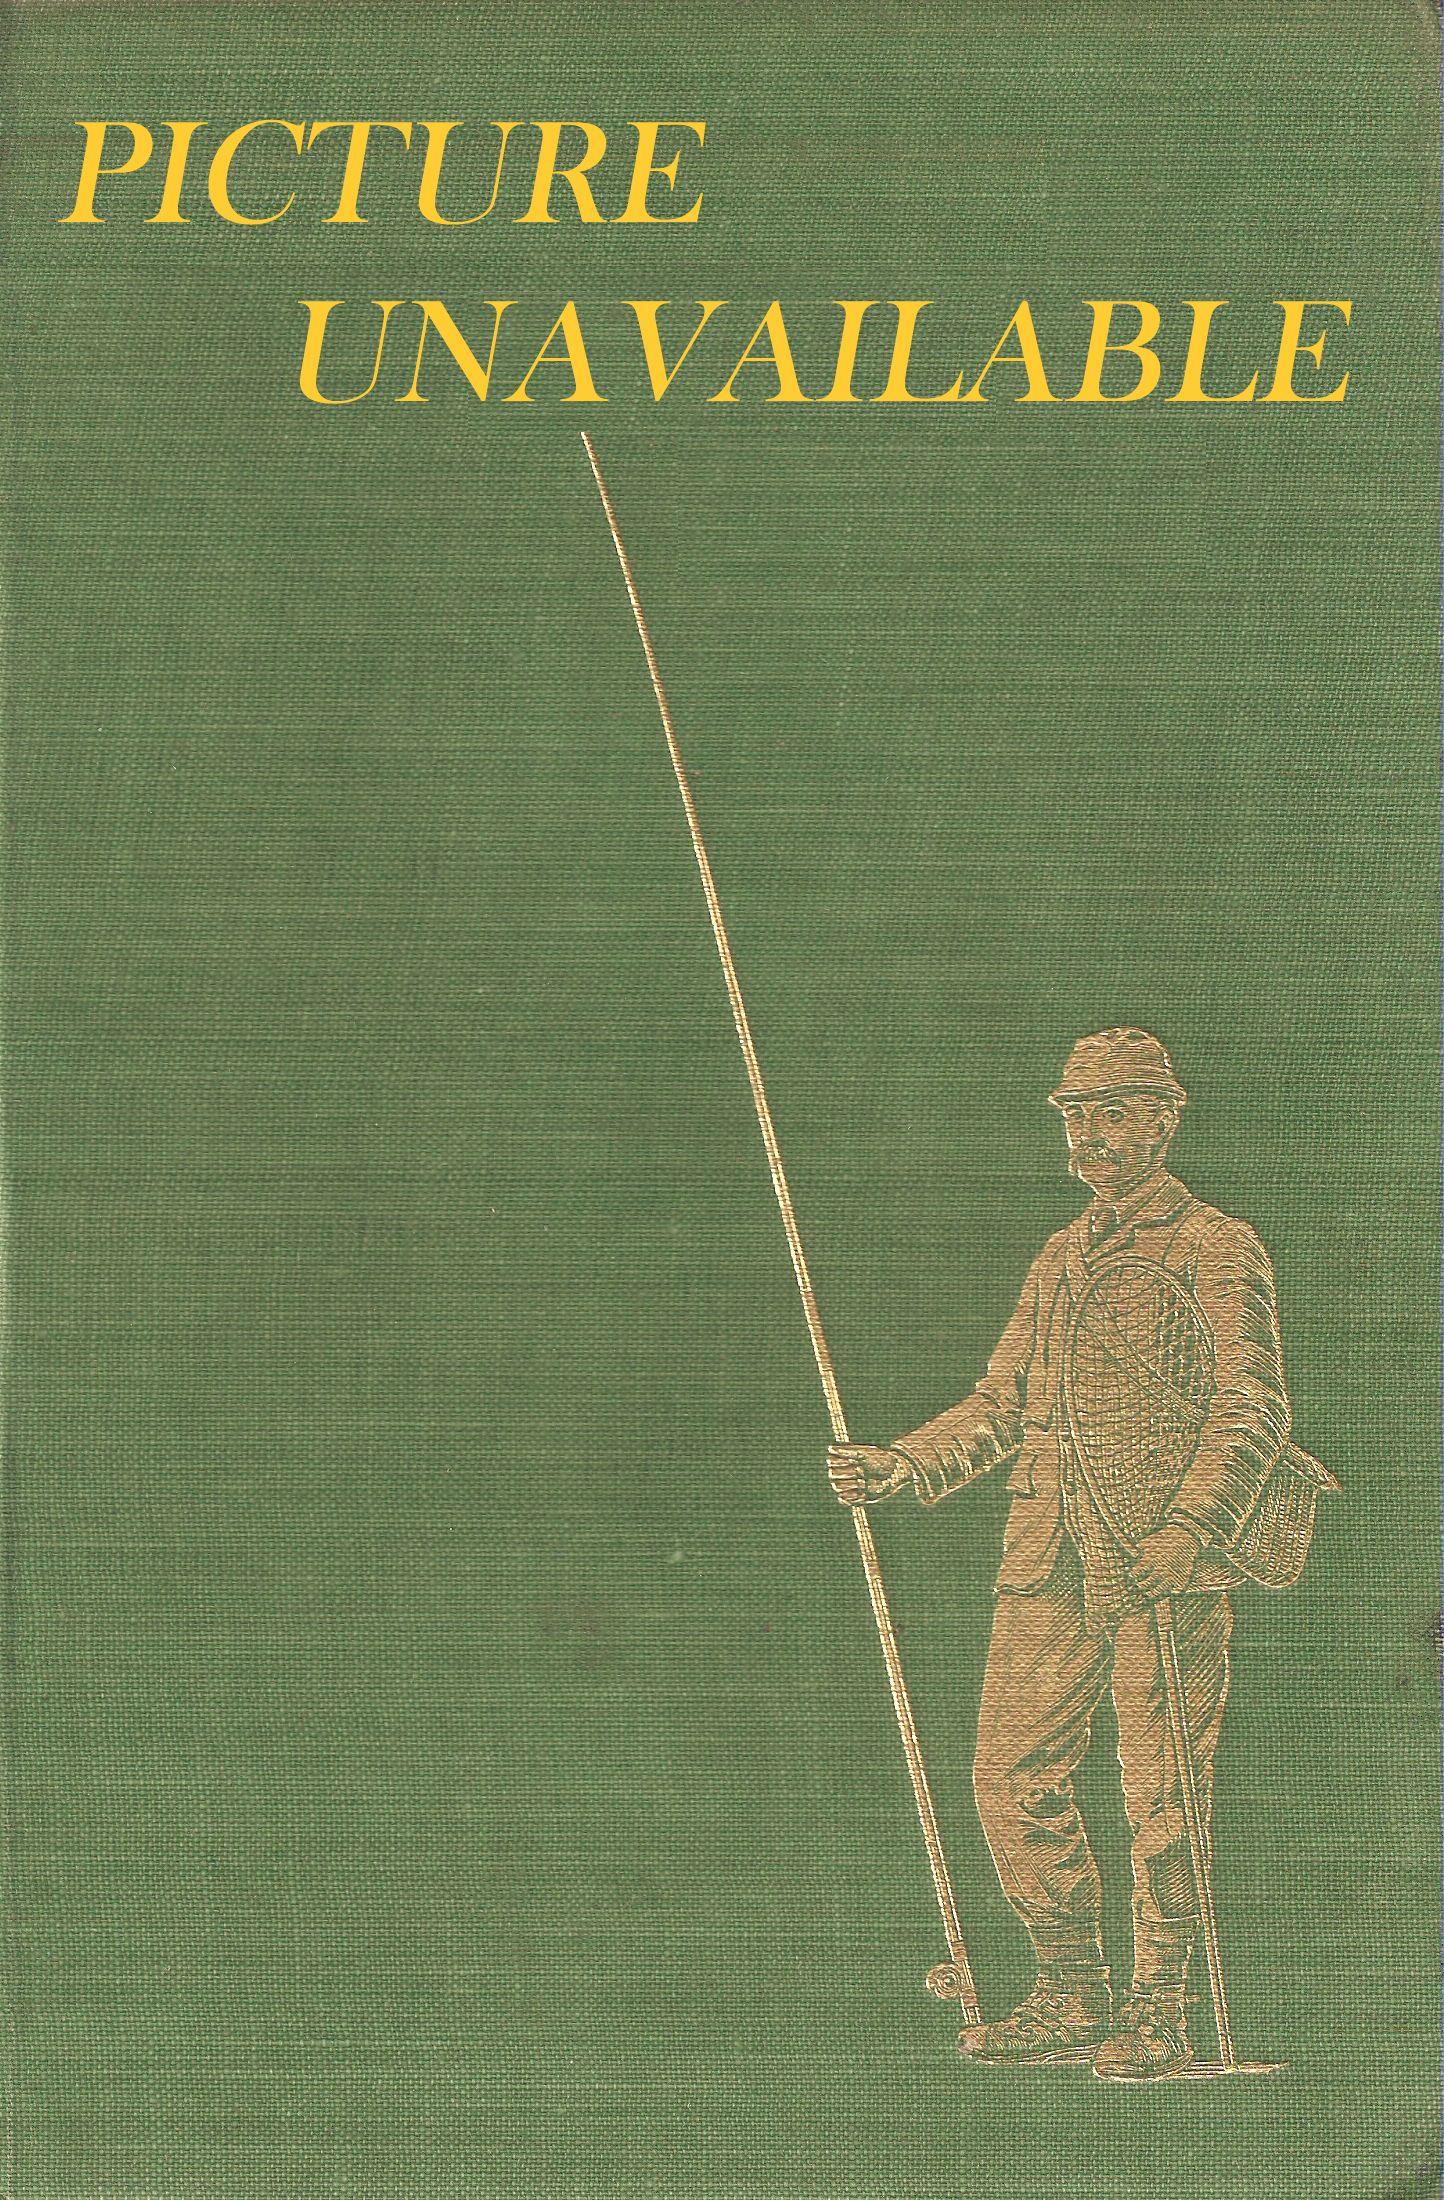 CARP: PERFECT DAYS. By John Bailey.